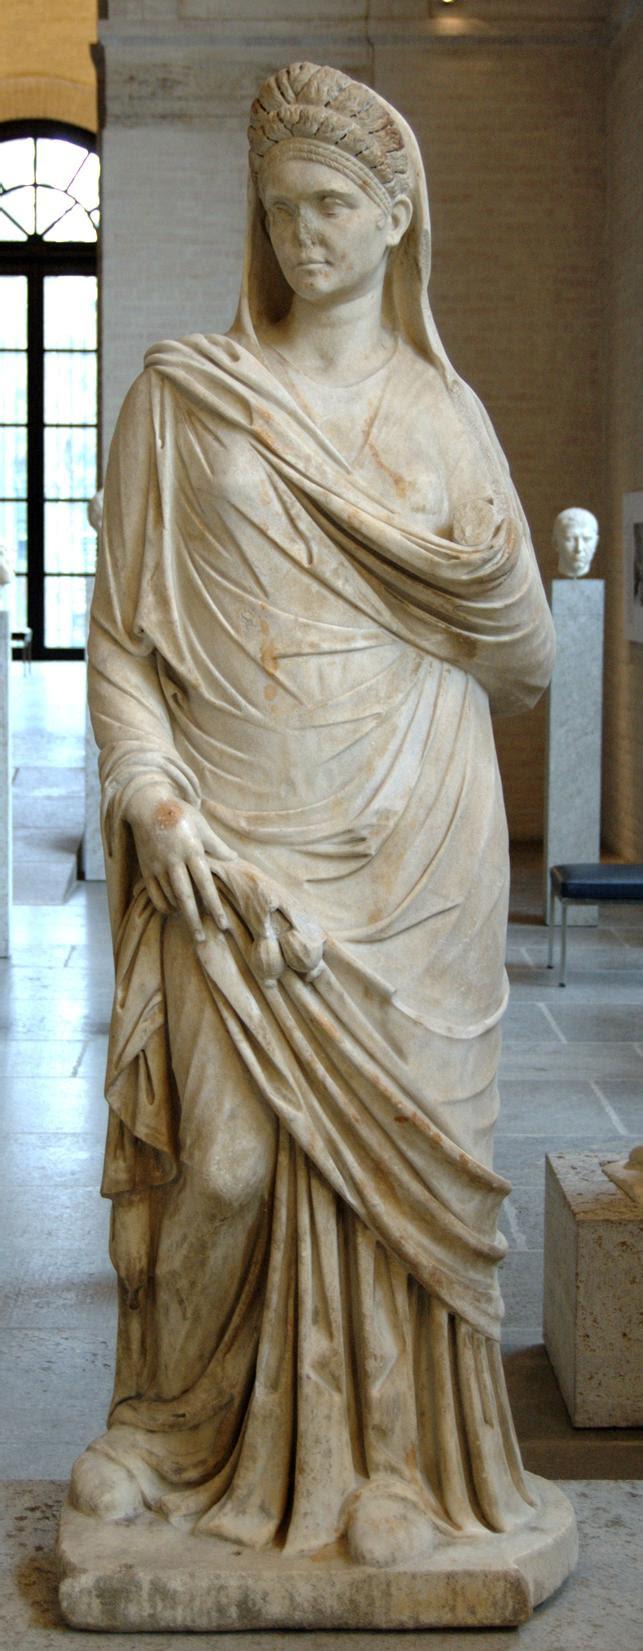 https://upload.wikimedia.org/wikipedia/commons/4/43/Roman_woman_Glyptothek_Munich_377.jpg